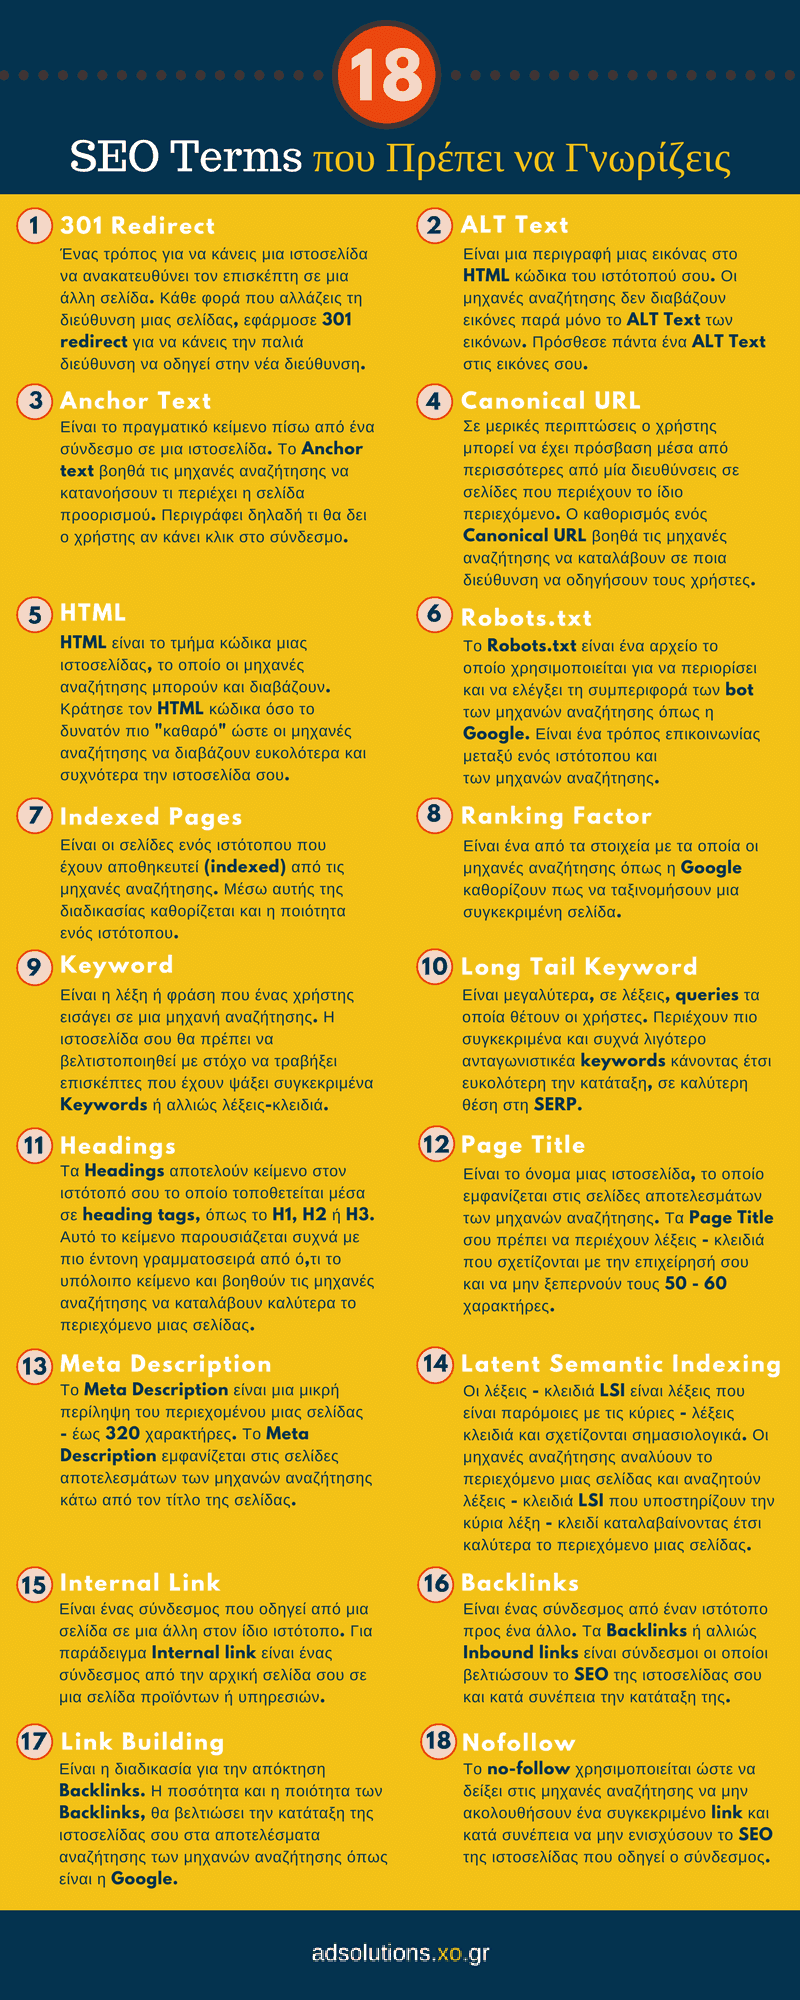 18 SEO Terms που Πρέπει να Γνωρίζεις [Infographic]